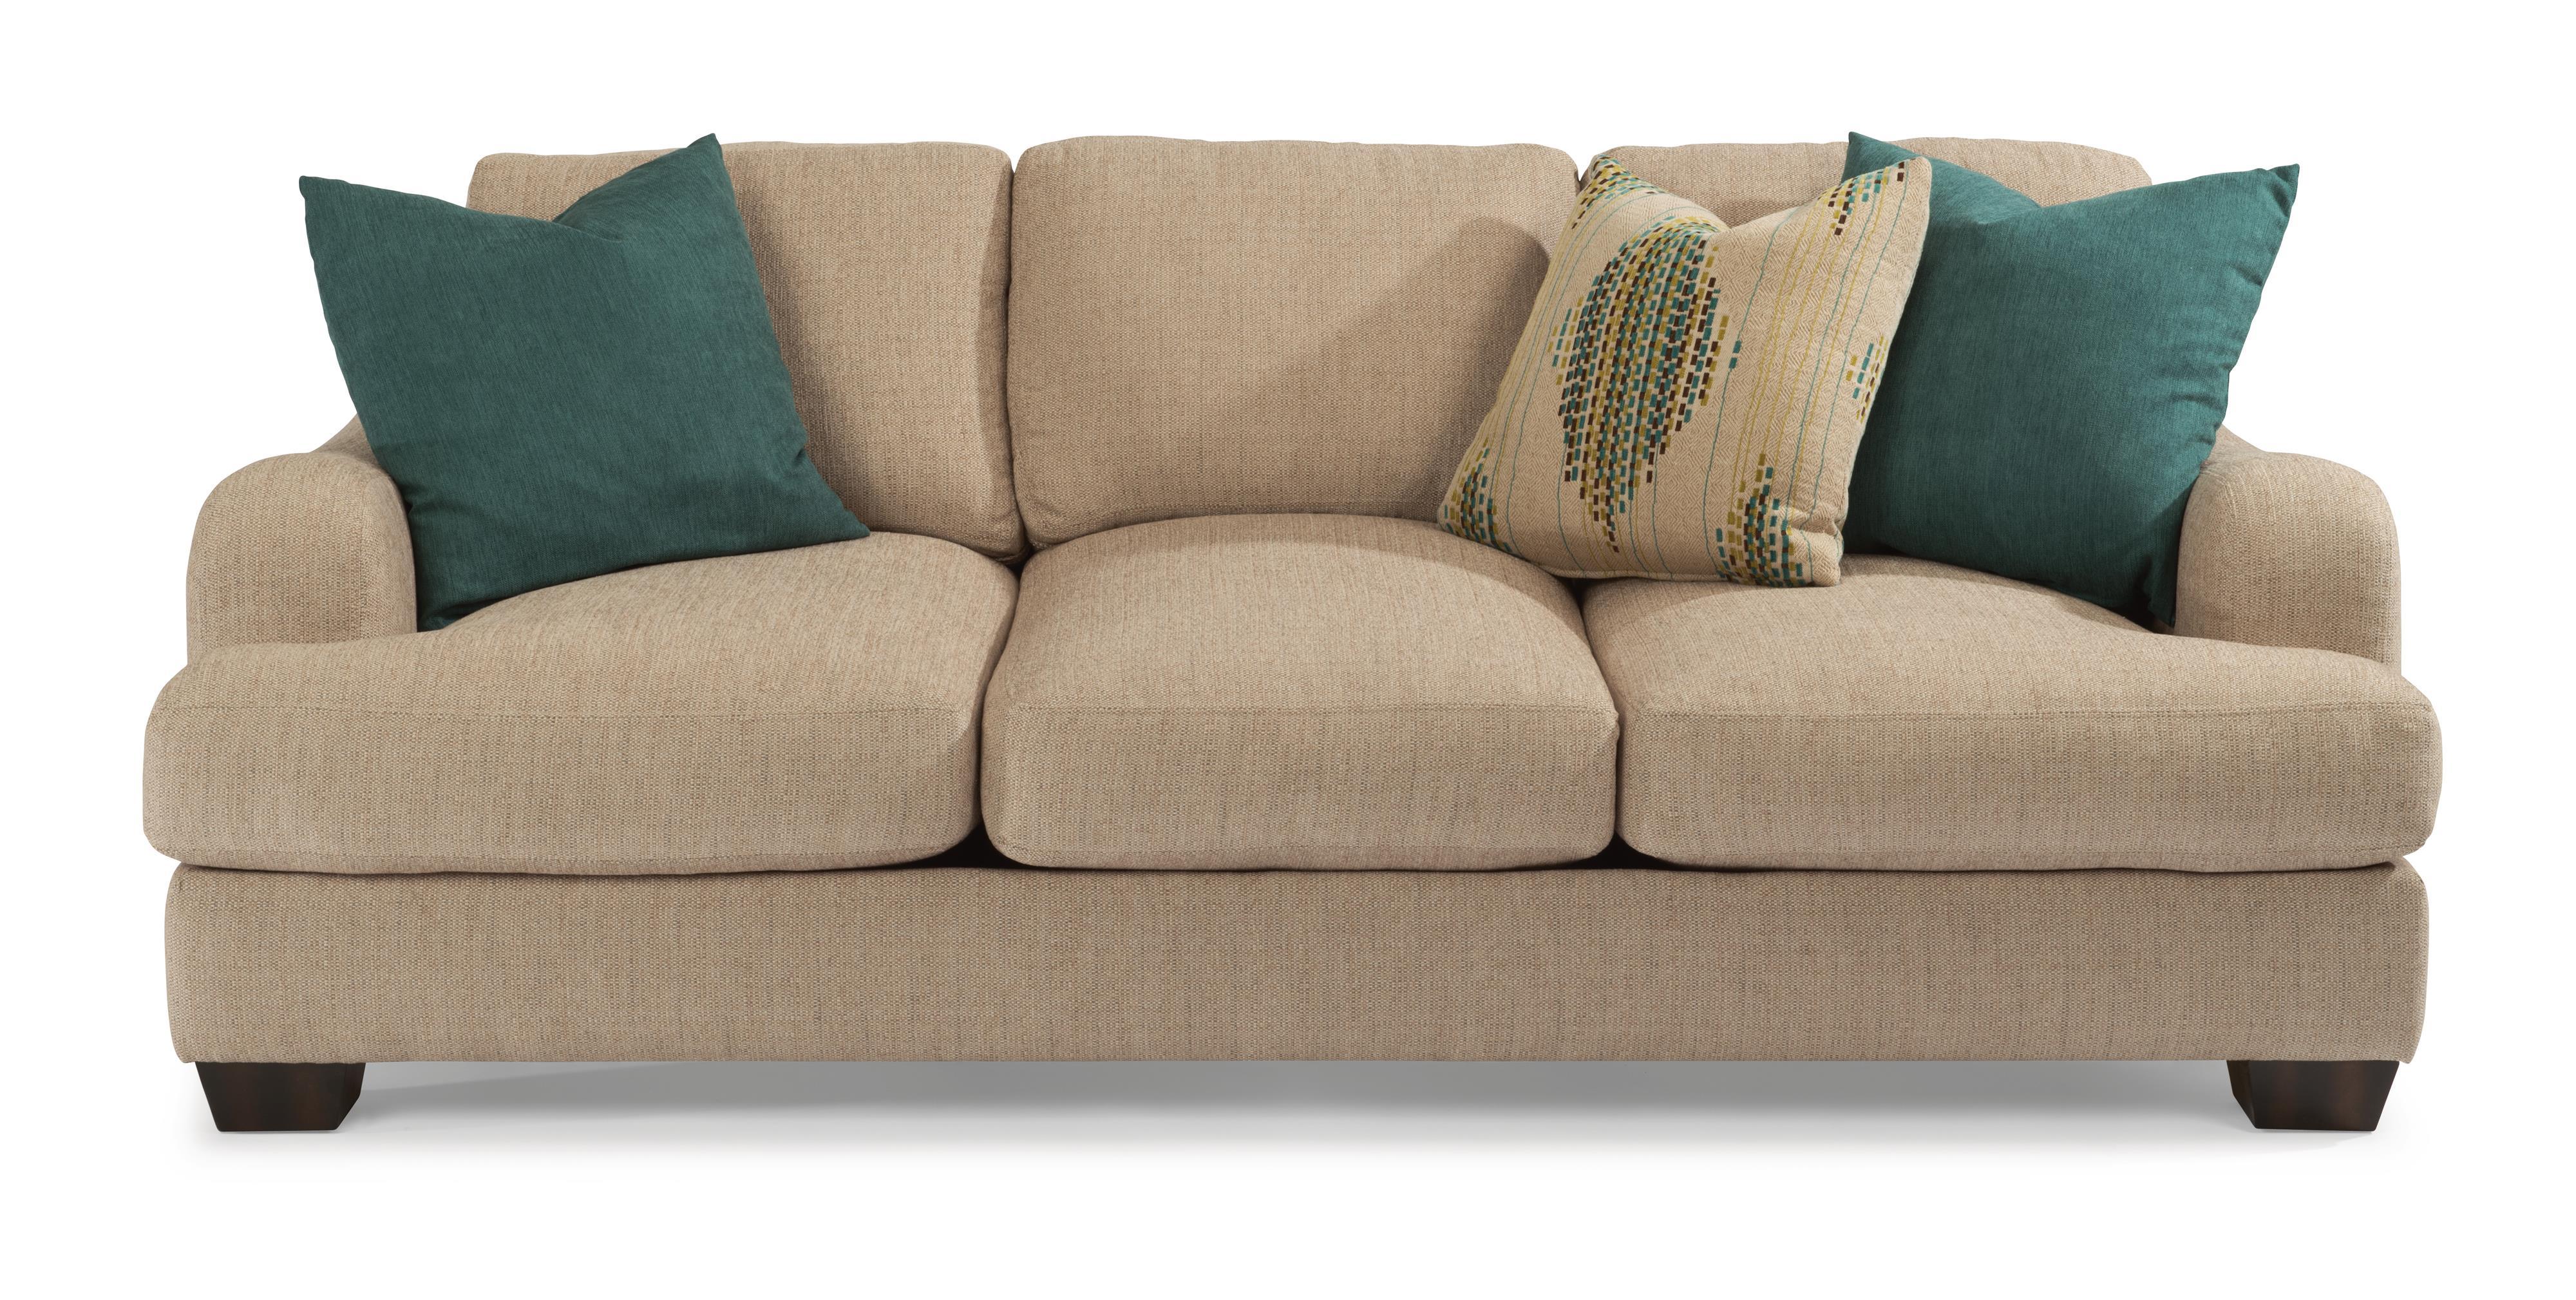 Flexsteel Vanessa Stationary Sofa   Item Number: 9311 31 912 11